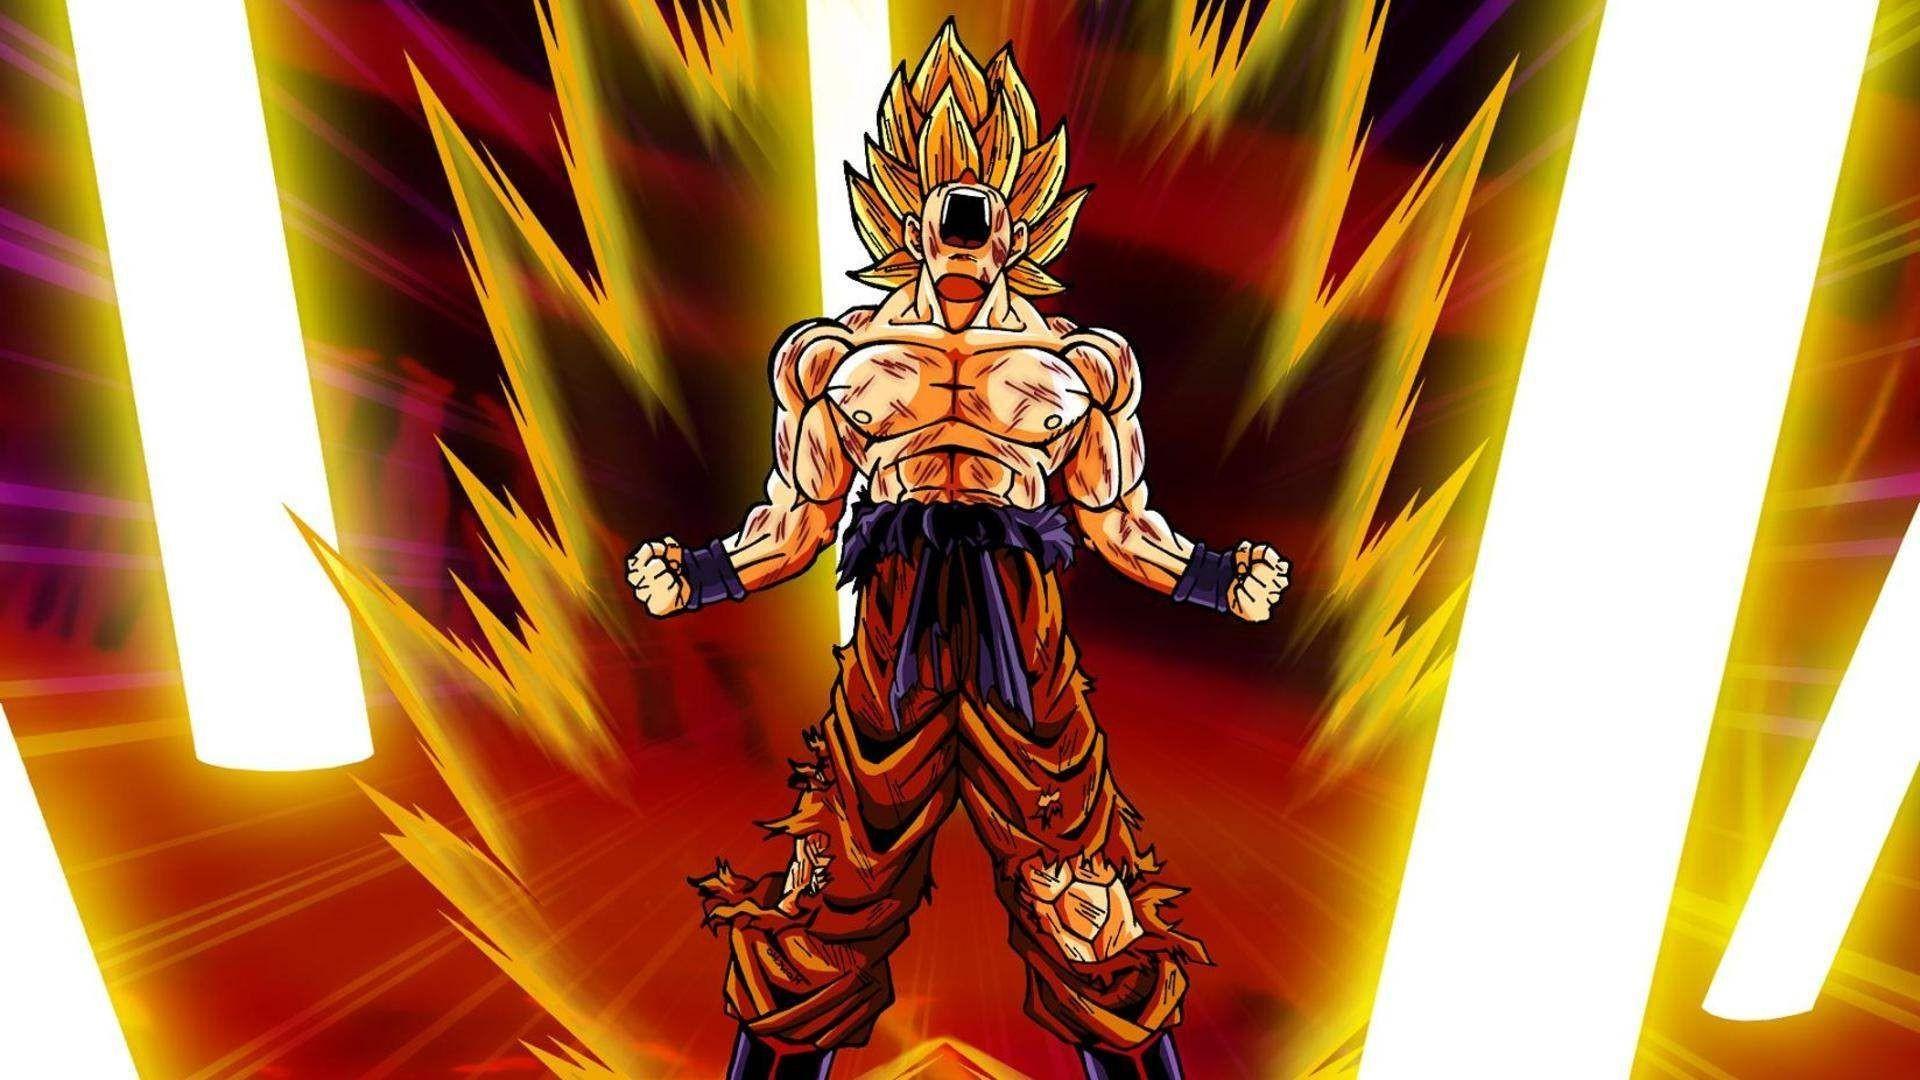 Goku Super Saiyan Wallpaper (72+ Images